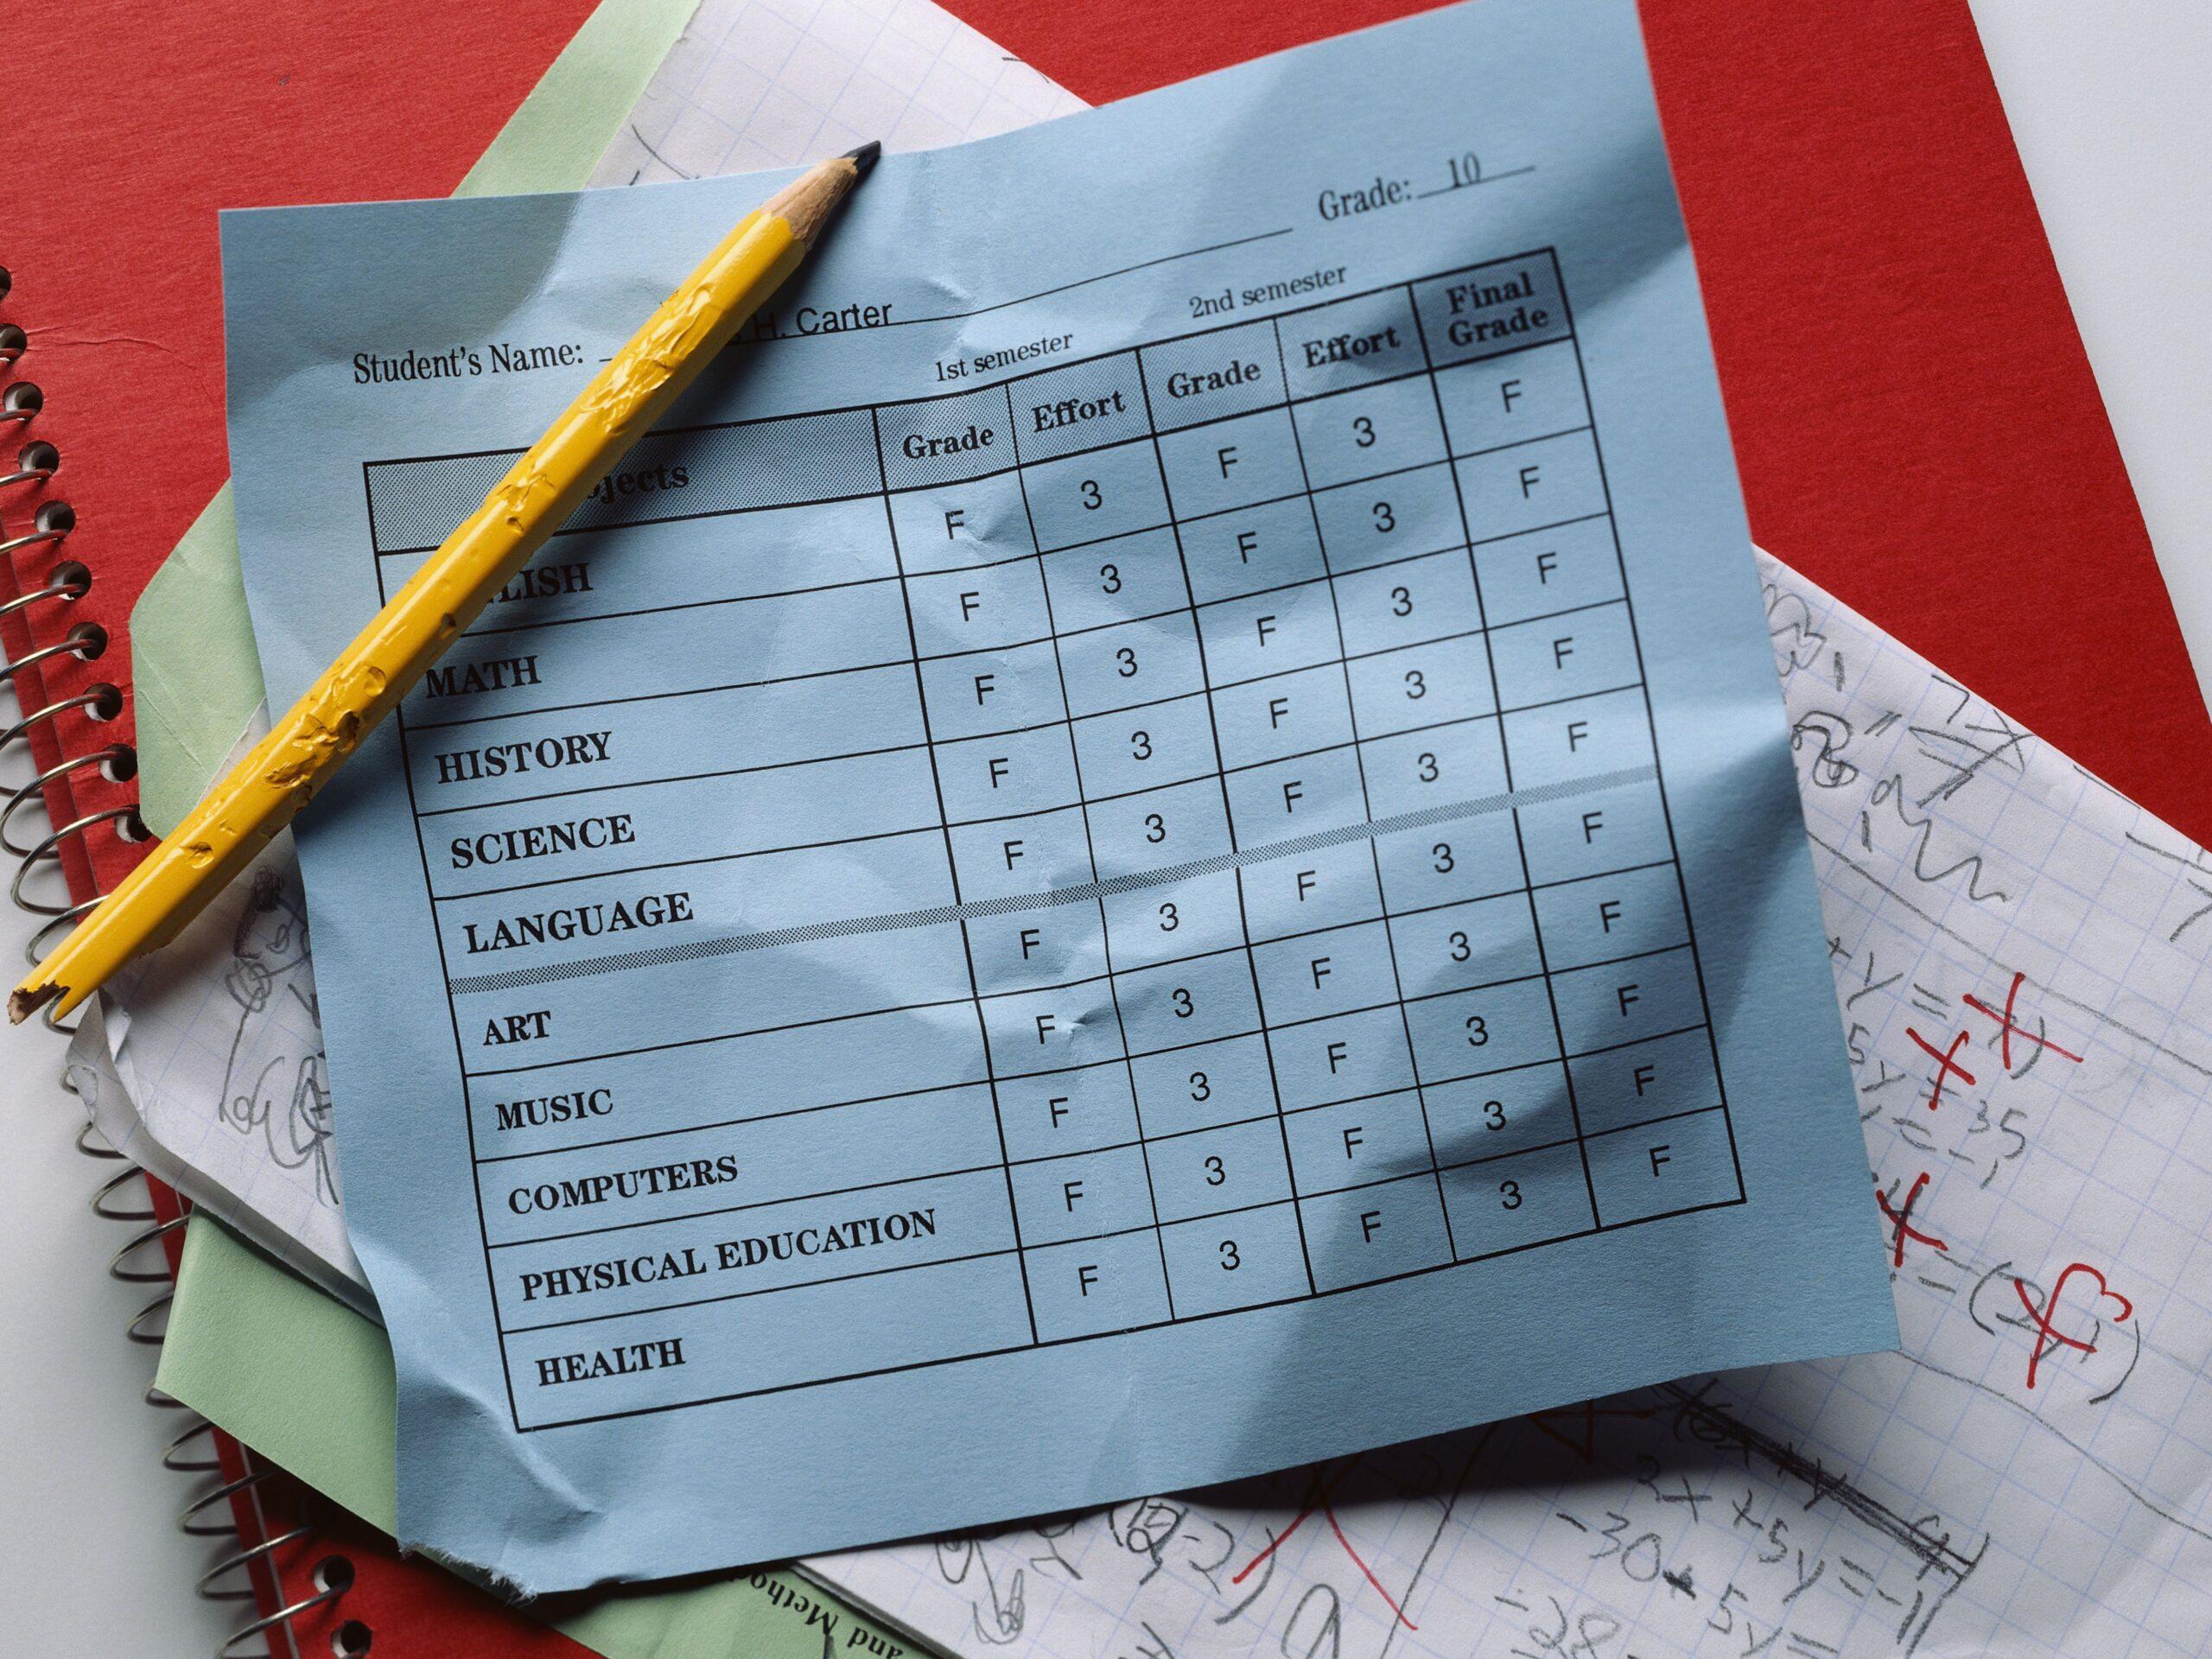 Overcoming Bad Grades